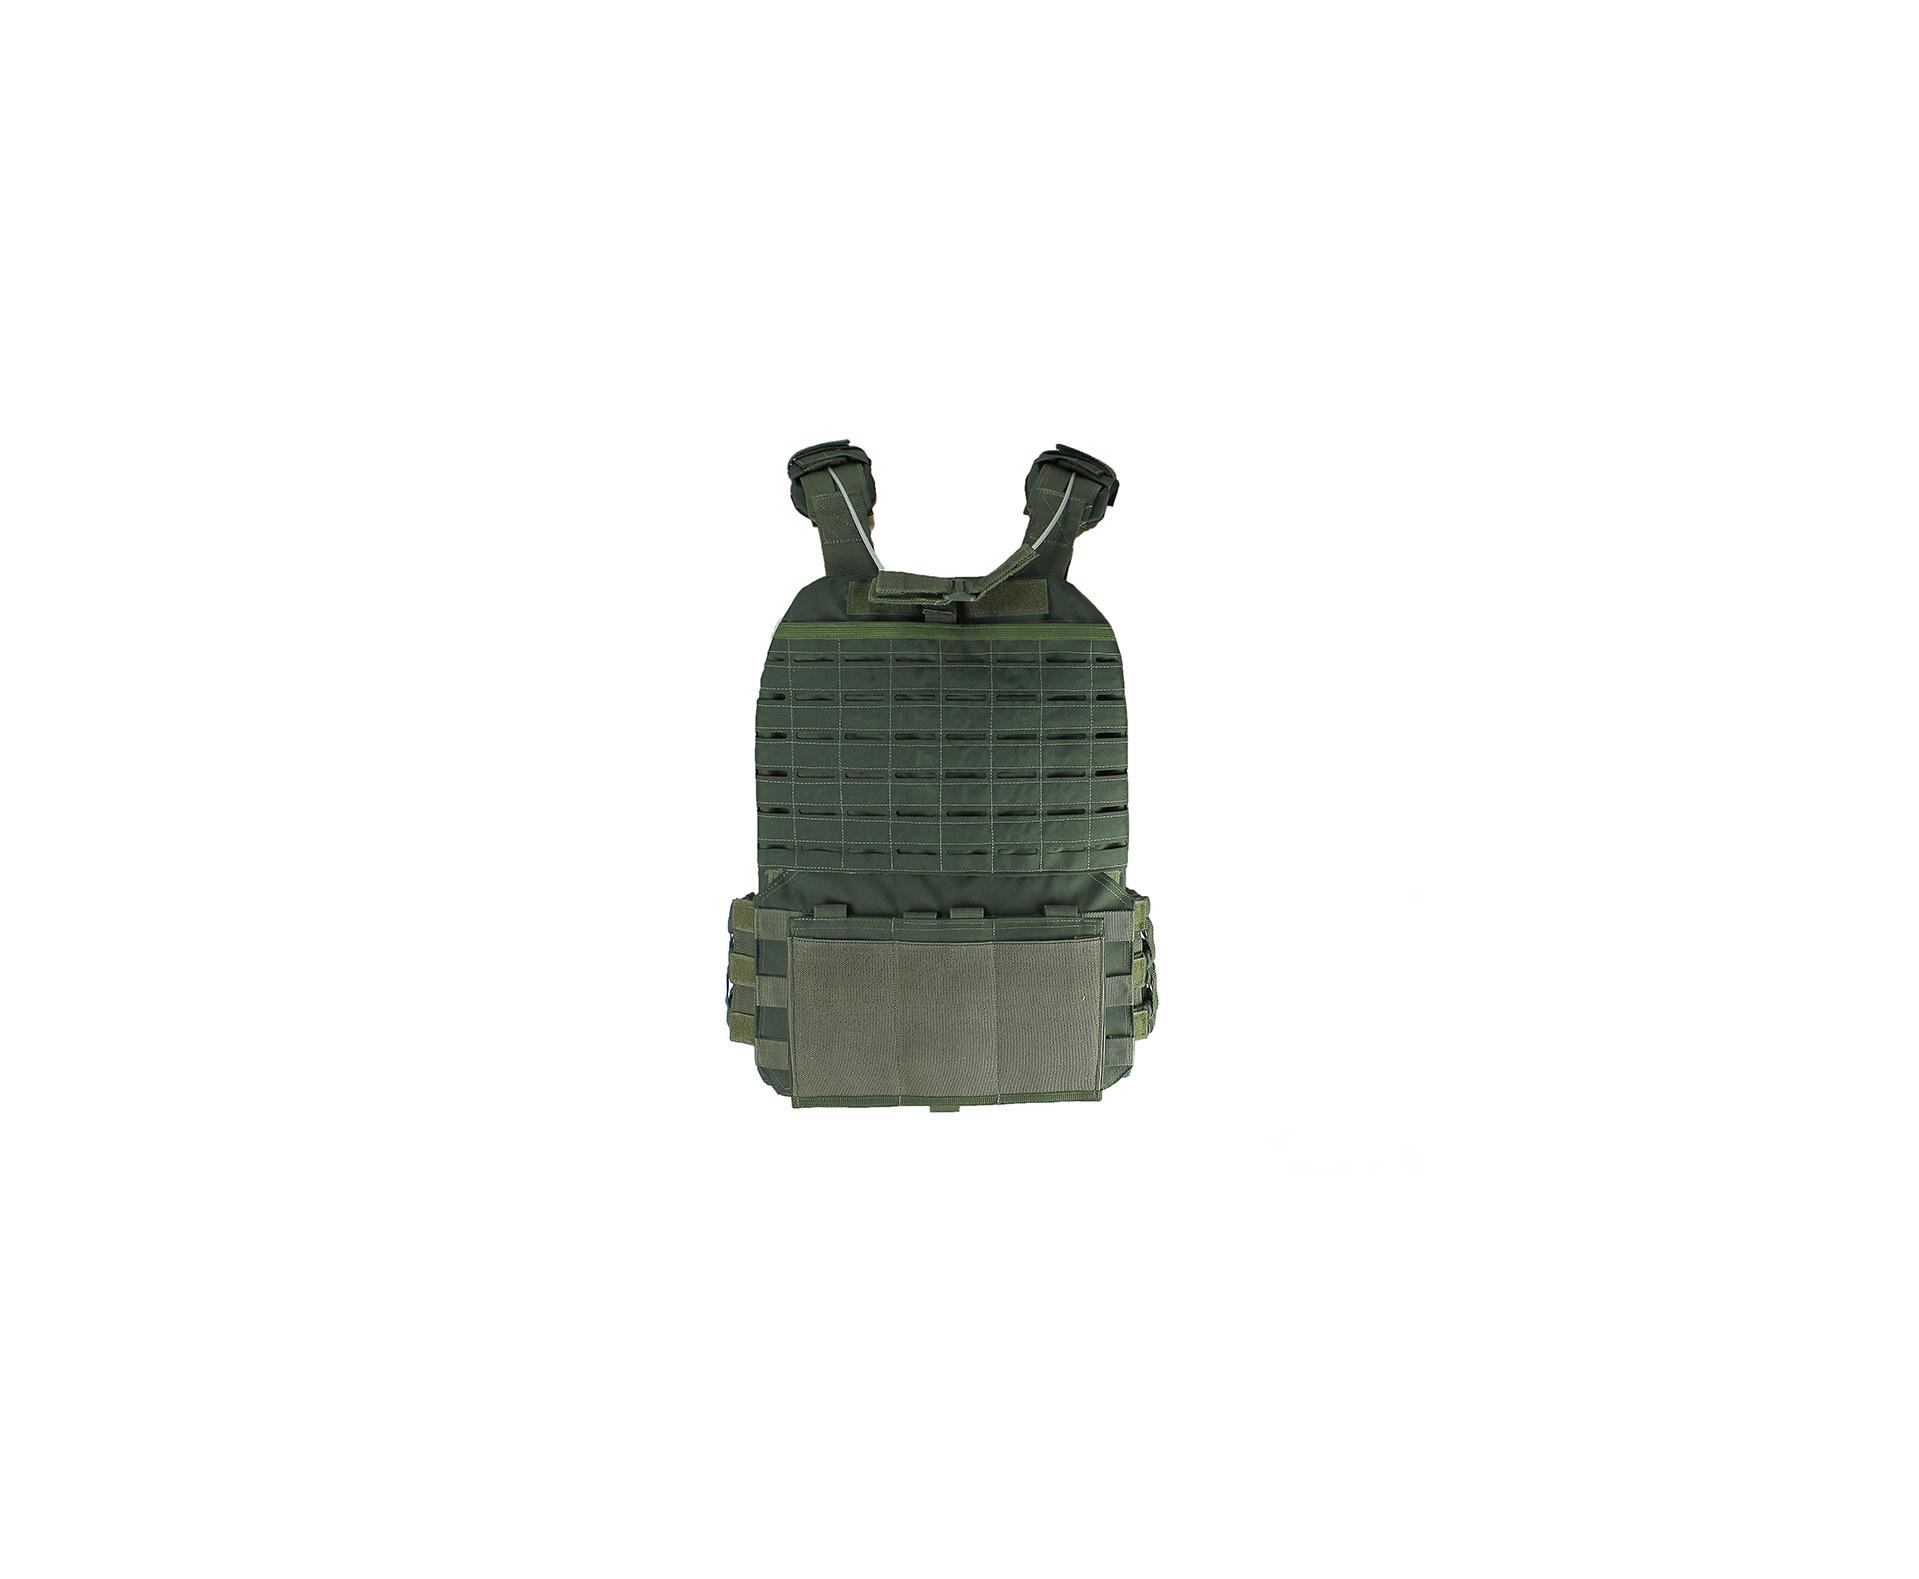 Colete Tático Hercules Plate Carrier Verde + Acessorio Mdc